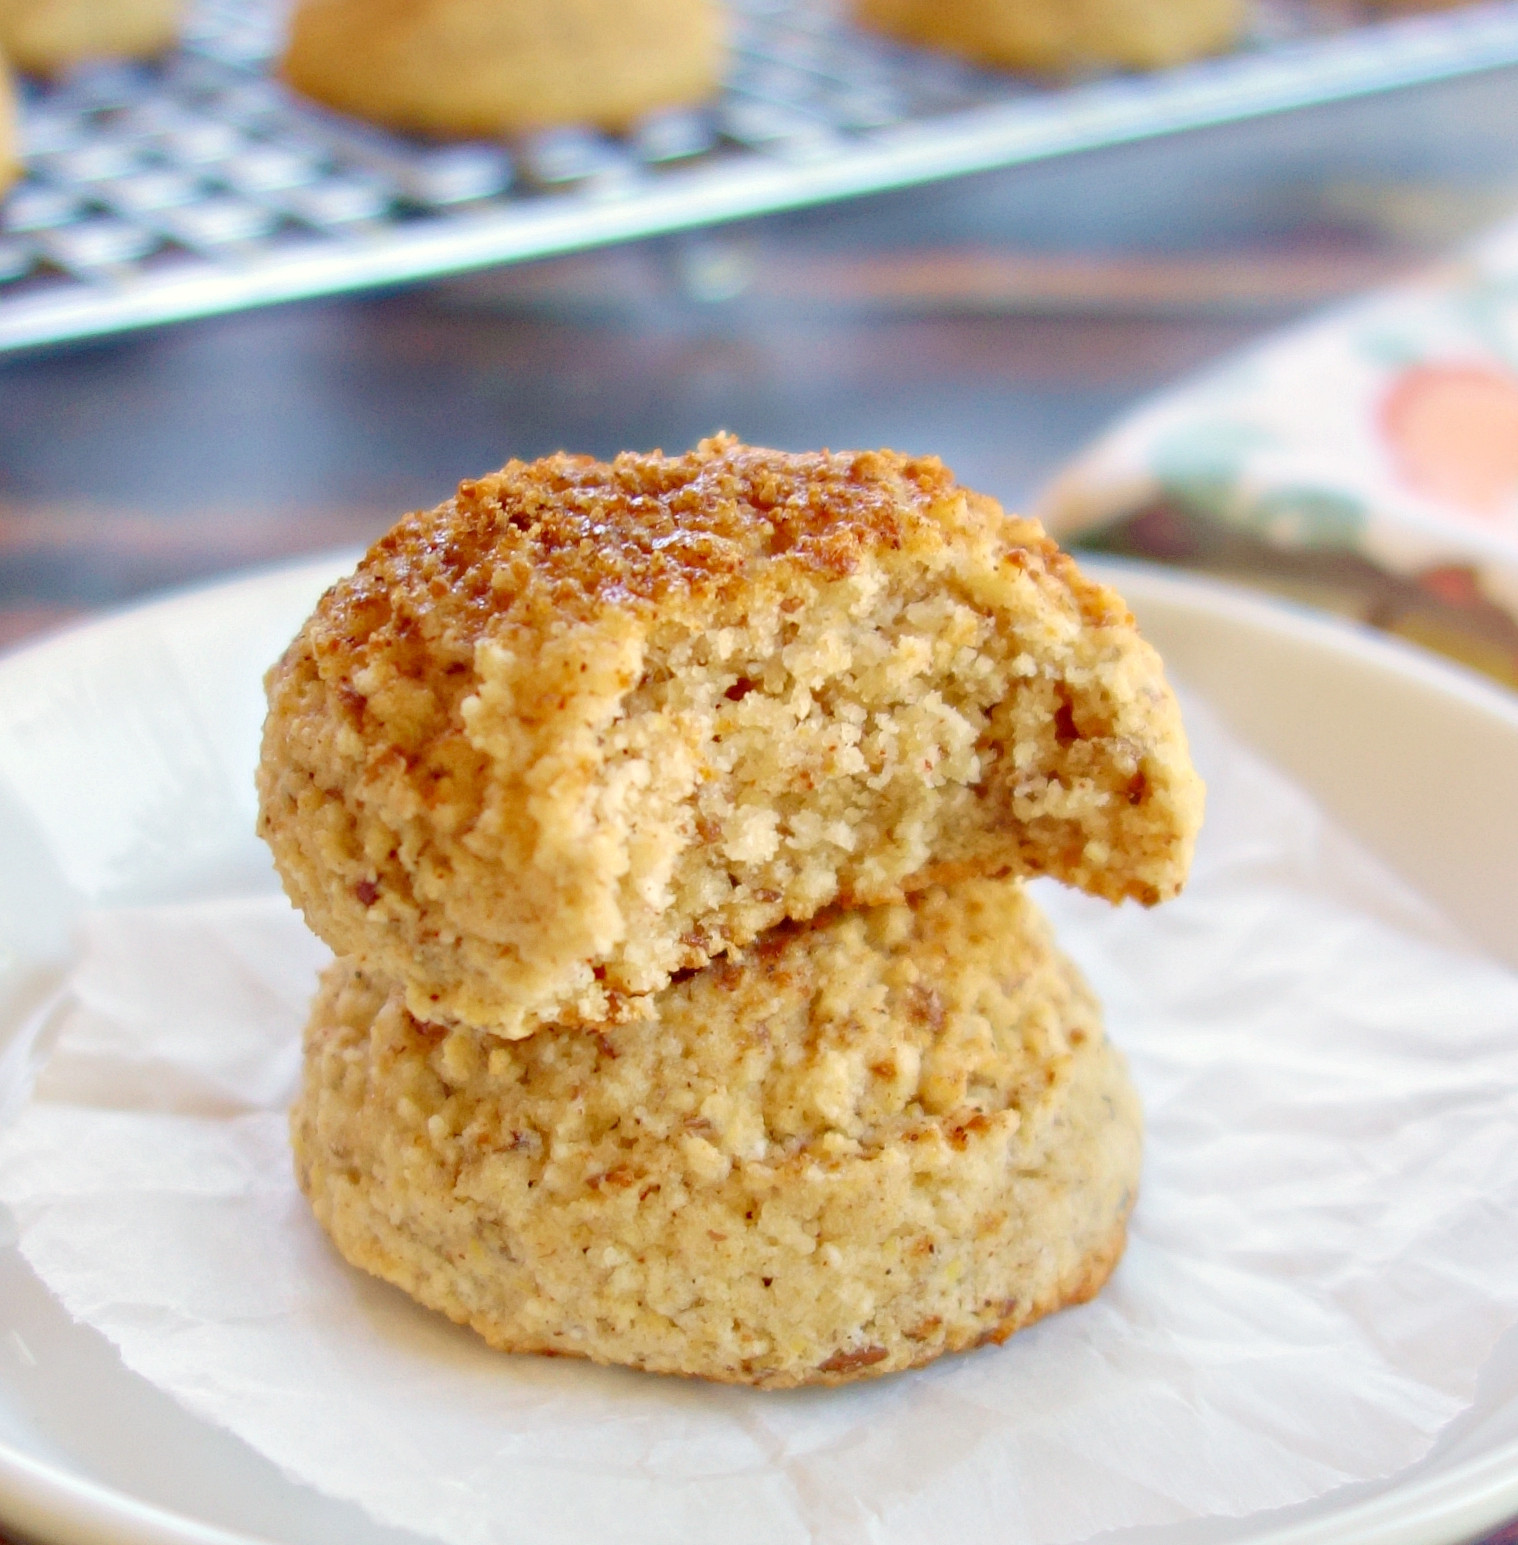 Coconut Flour Bread Vegan  Coconut Flour Snickerdoodles Vegan Paleo Grain Free